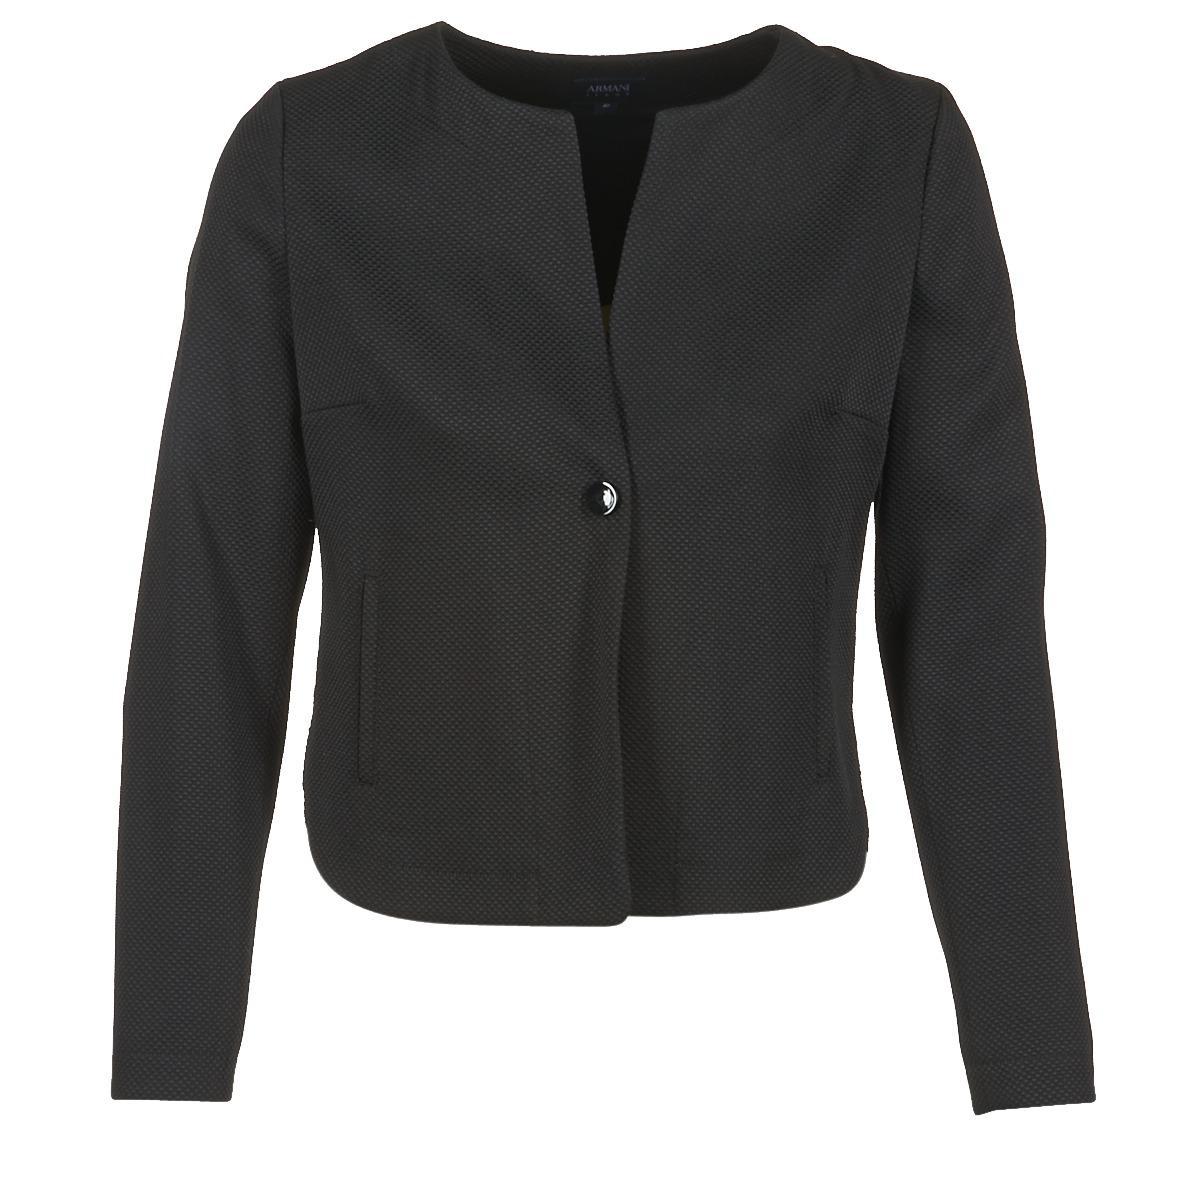 90a5df34 armani-jeans-black-Fraberga-Womens-Jacket-In-Black.jpeg